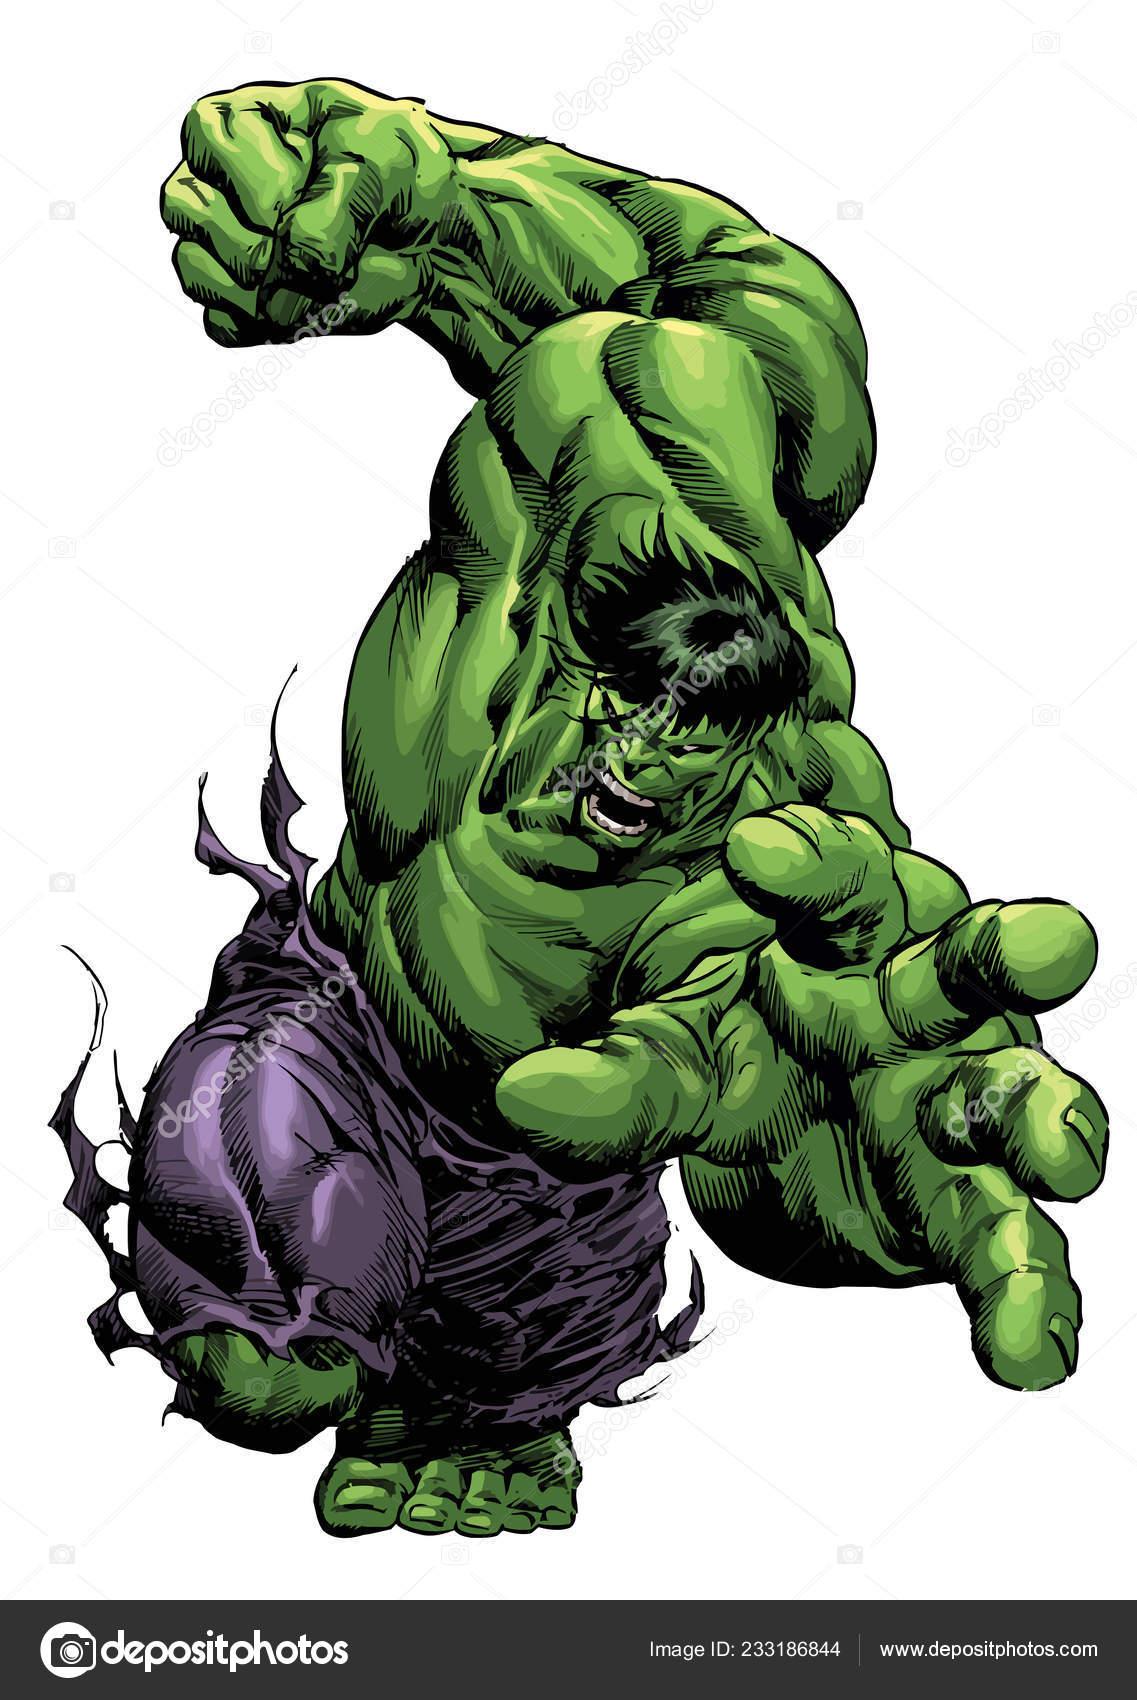 Áˆ The Hulk Stock Images Royalty Free Hulk Photos Download On Depositphotos